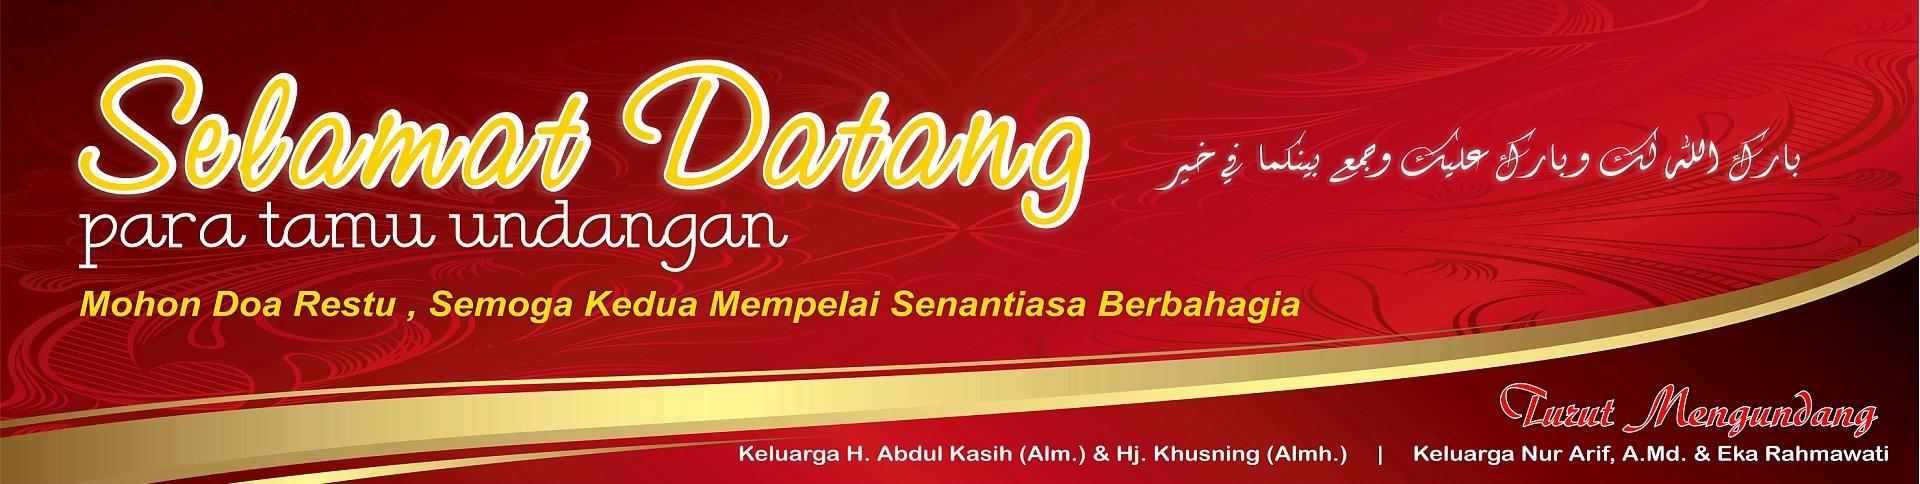 Design x banner pernikahan - Wedding 5